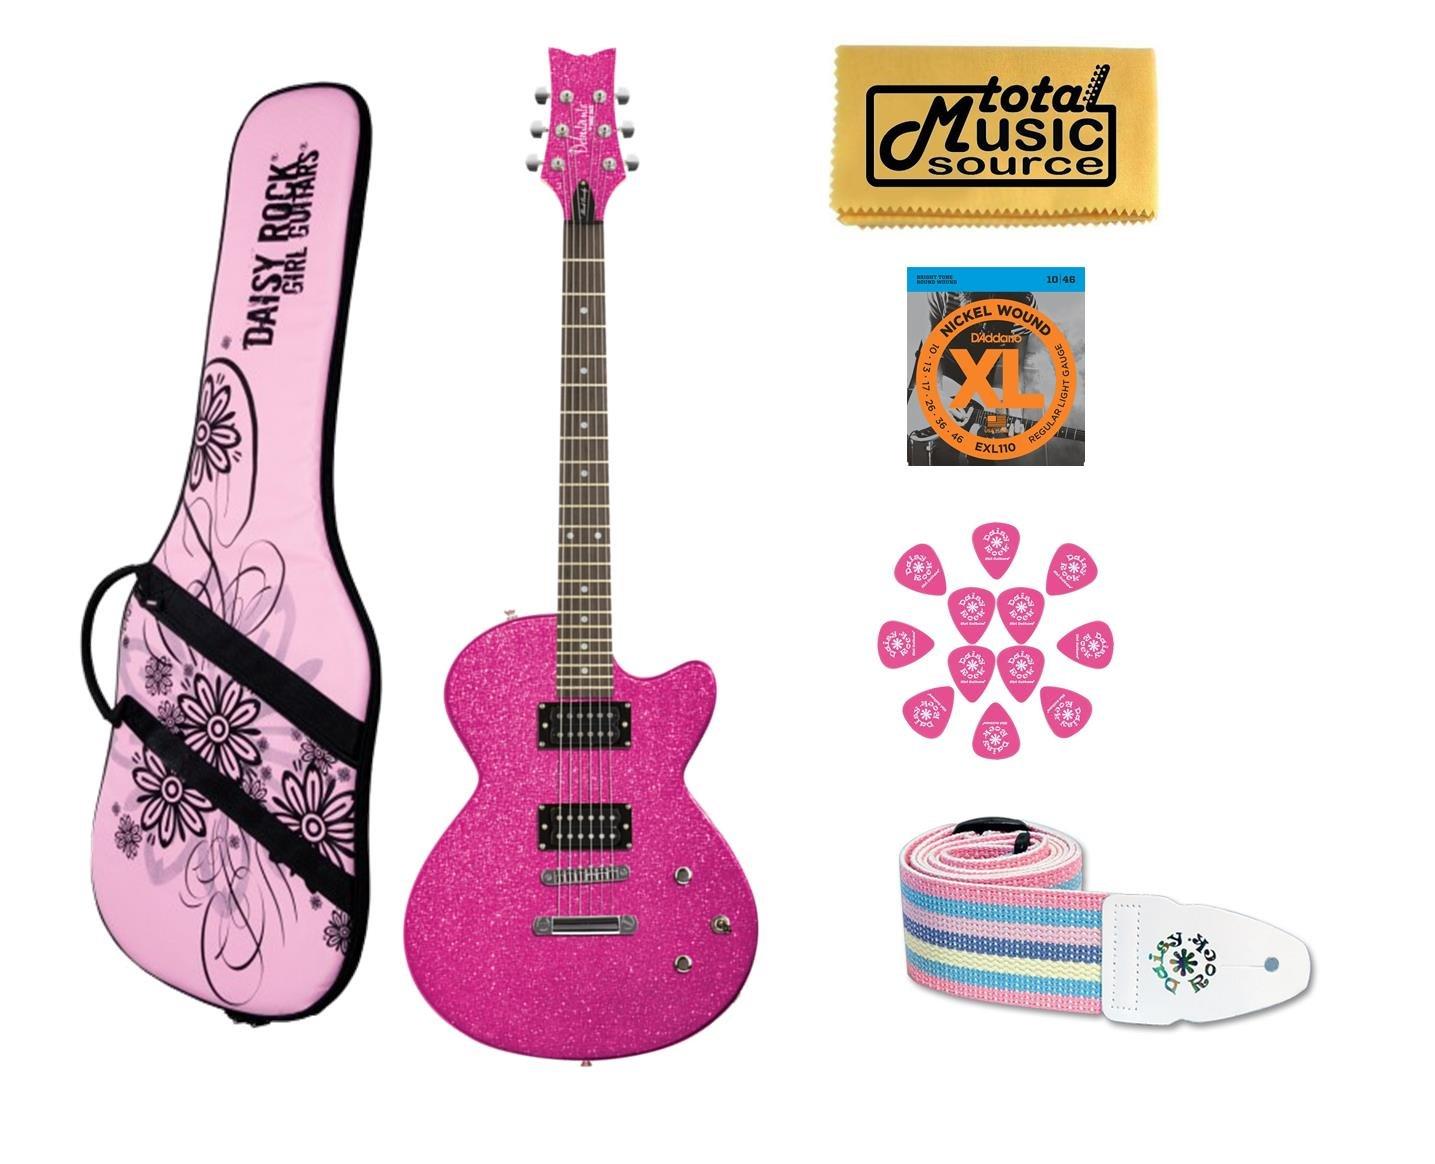 Cheap DAISY ROCK Debutante Rock Candy Atomic Pink Electric Guitar 14-7751 Black Friday & Cyber Monday 2019